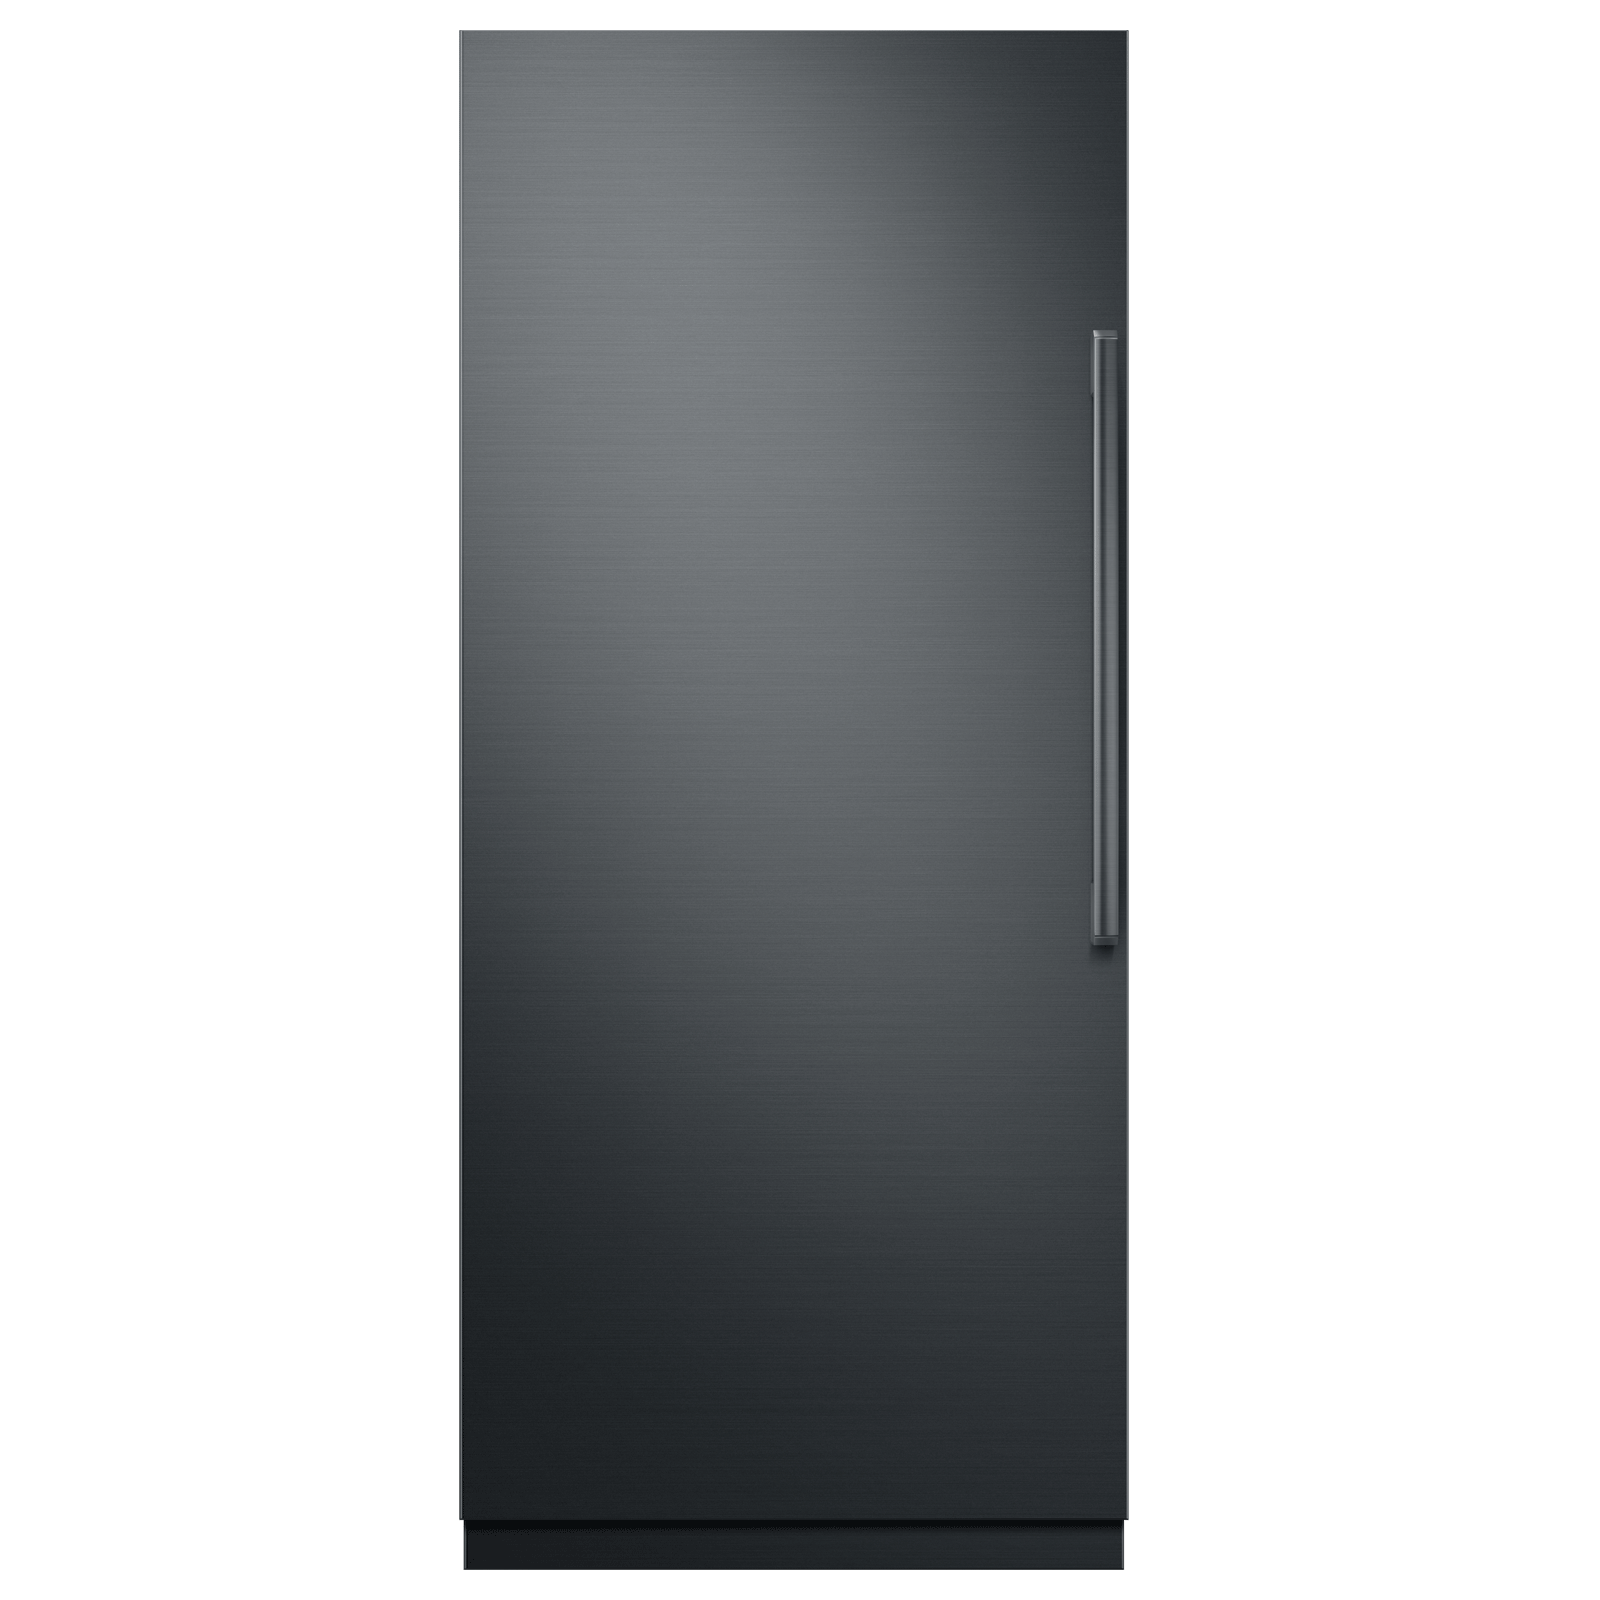 Model: DRR36980LAP | 36